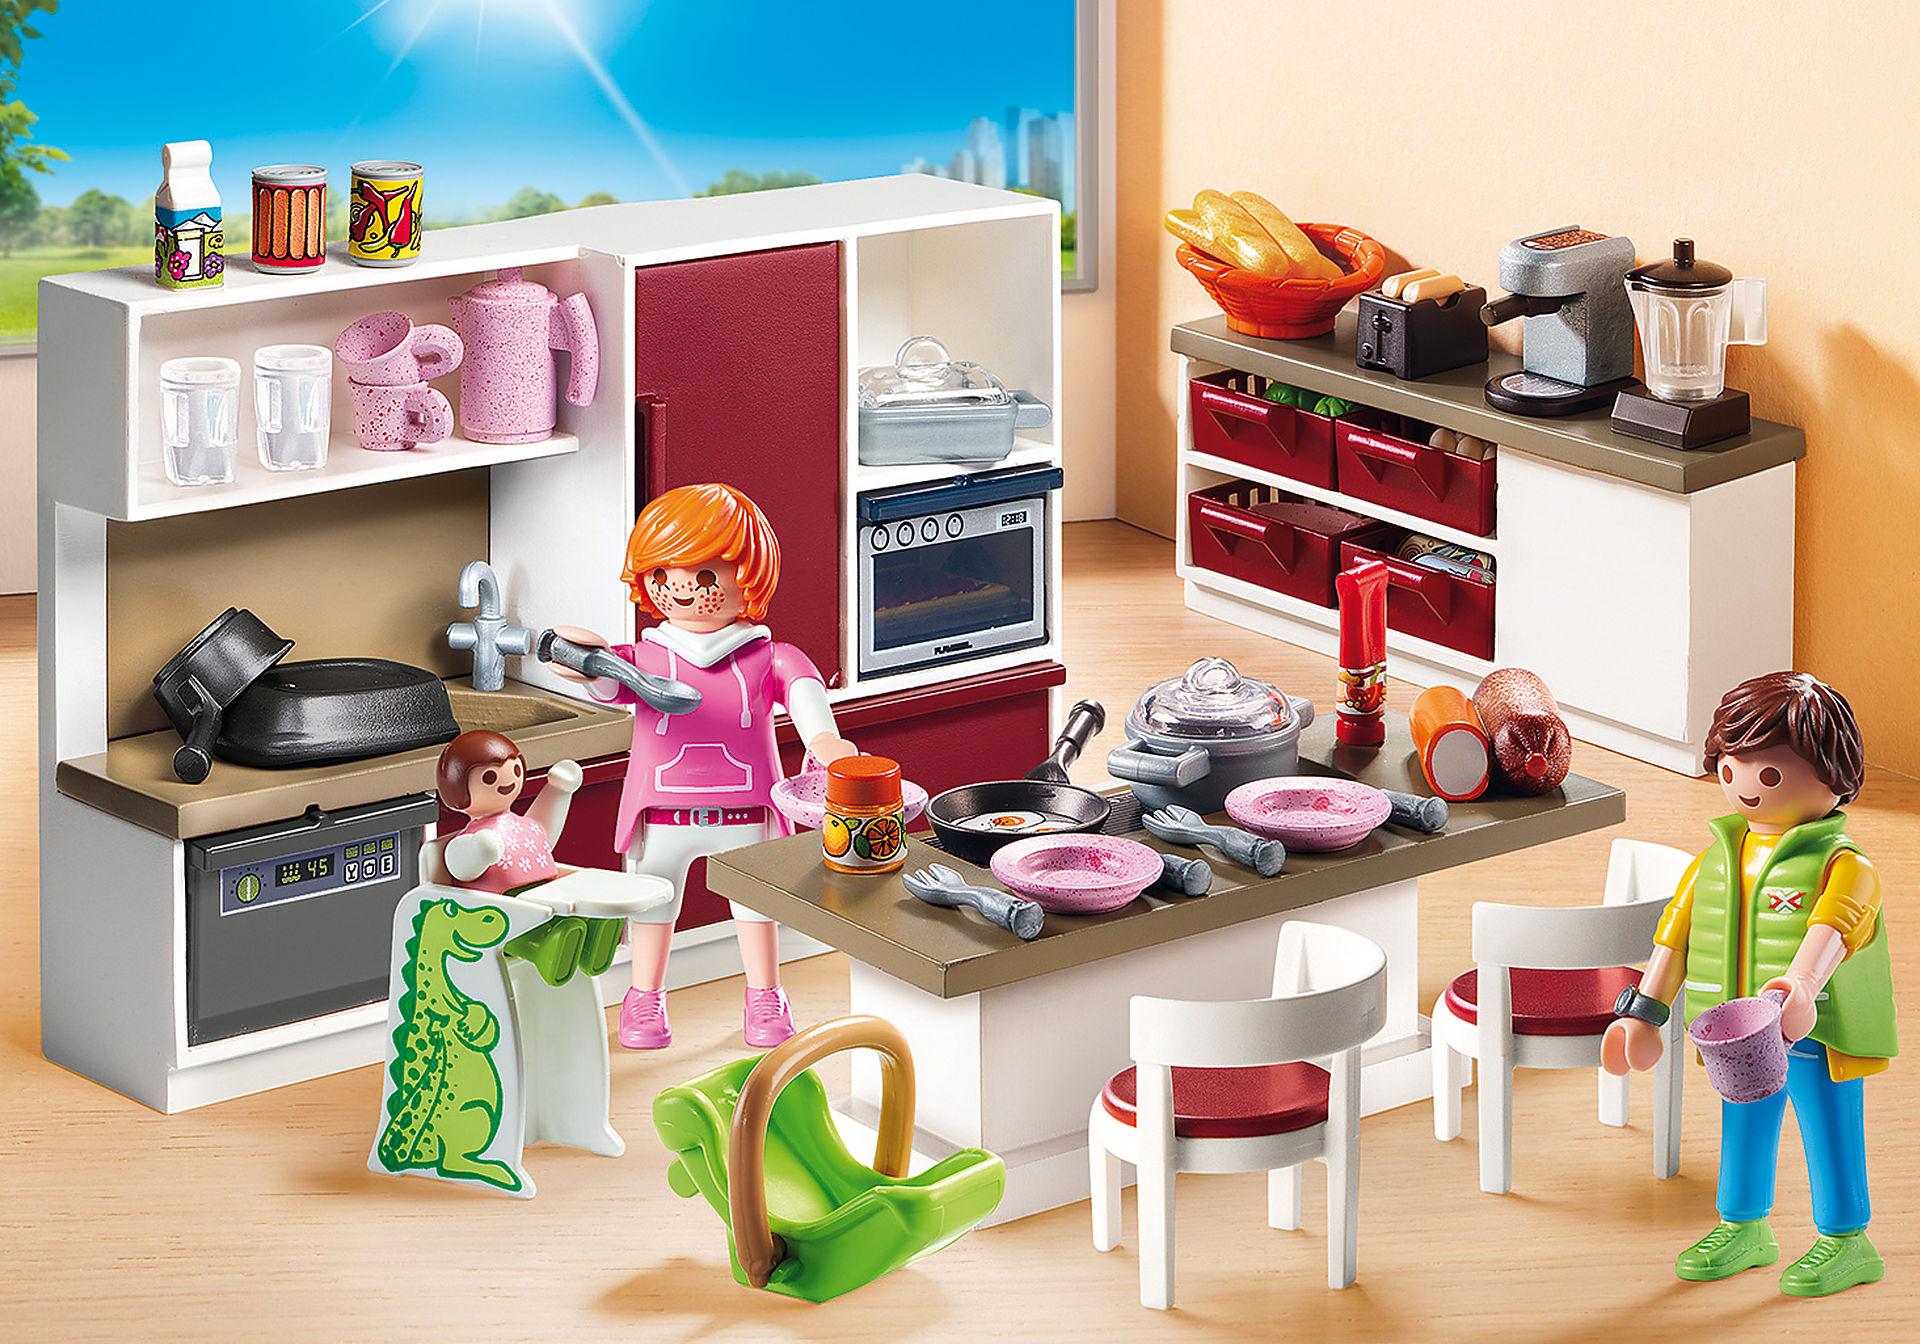 9269 Große Familienküche zoom image1